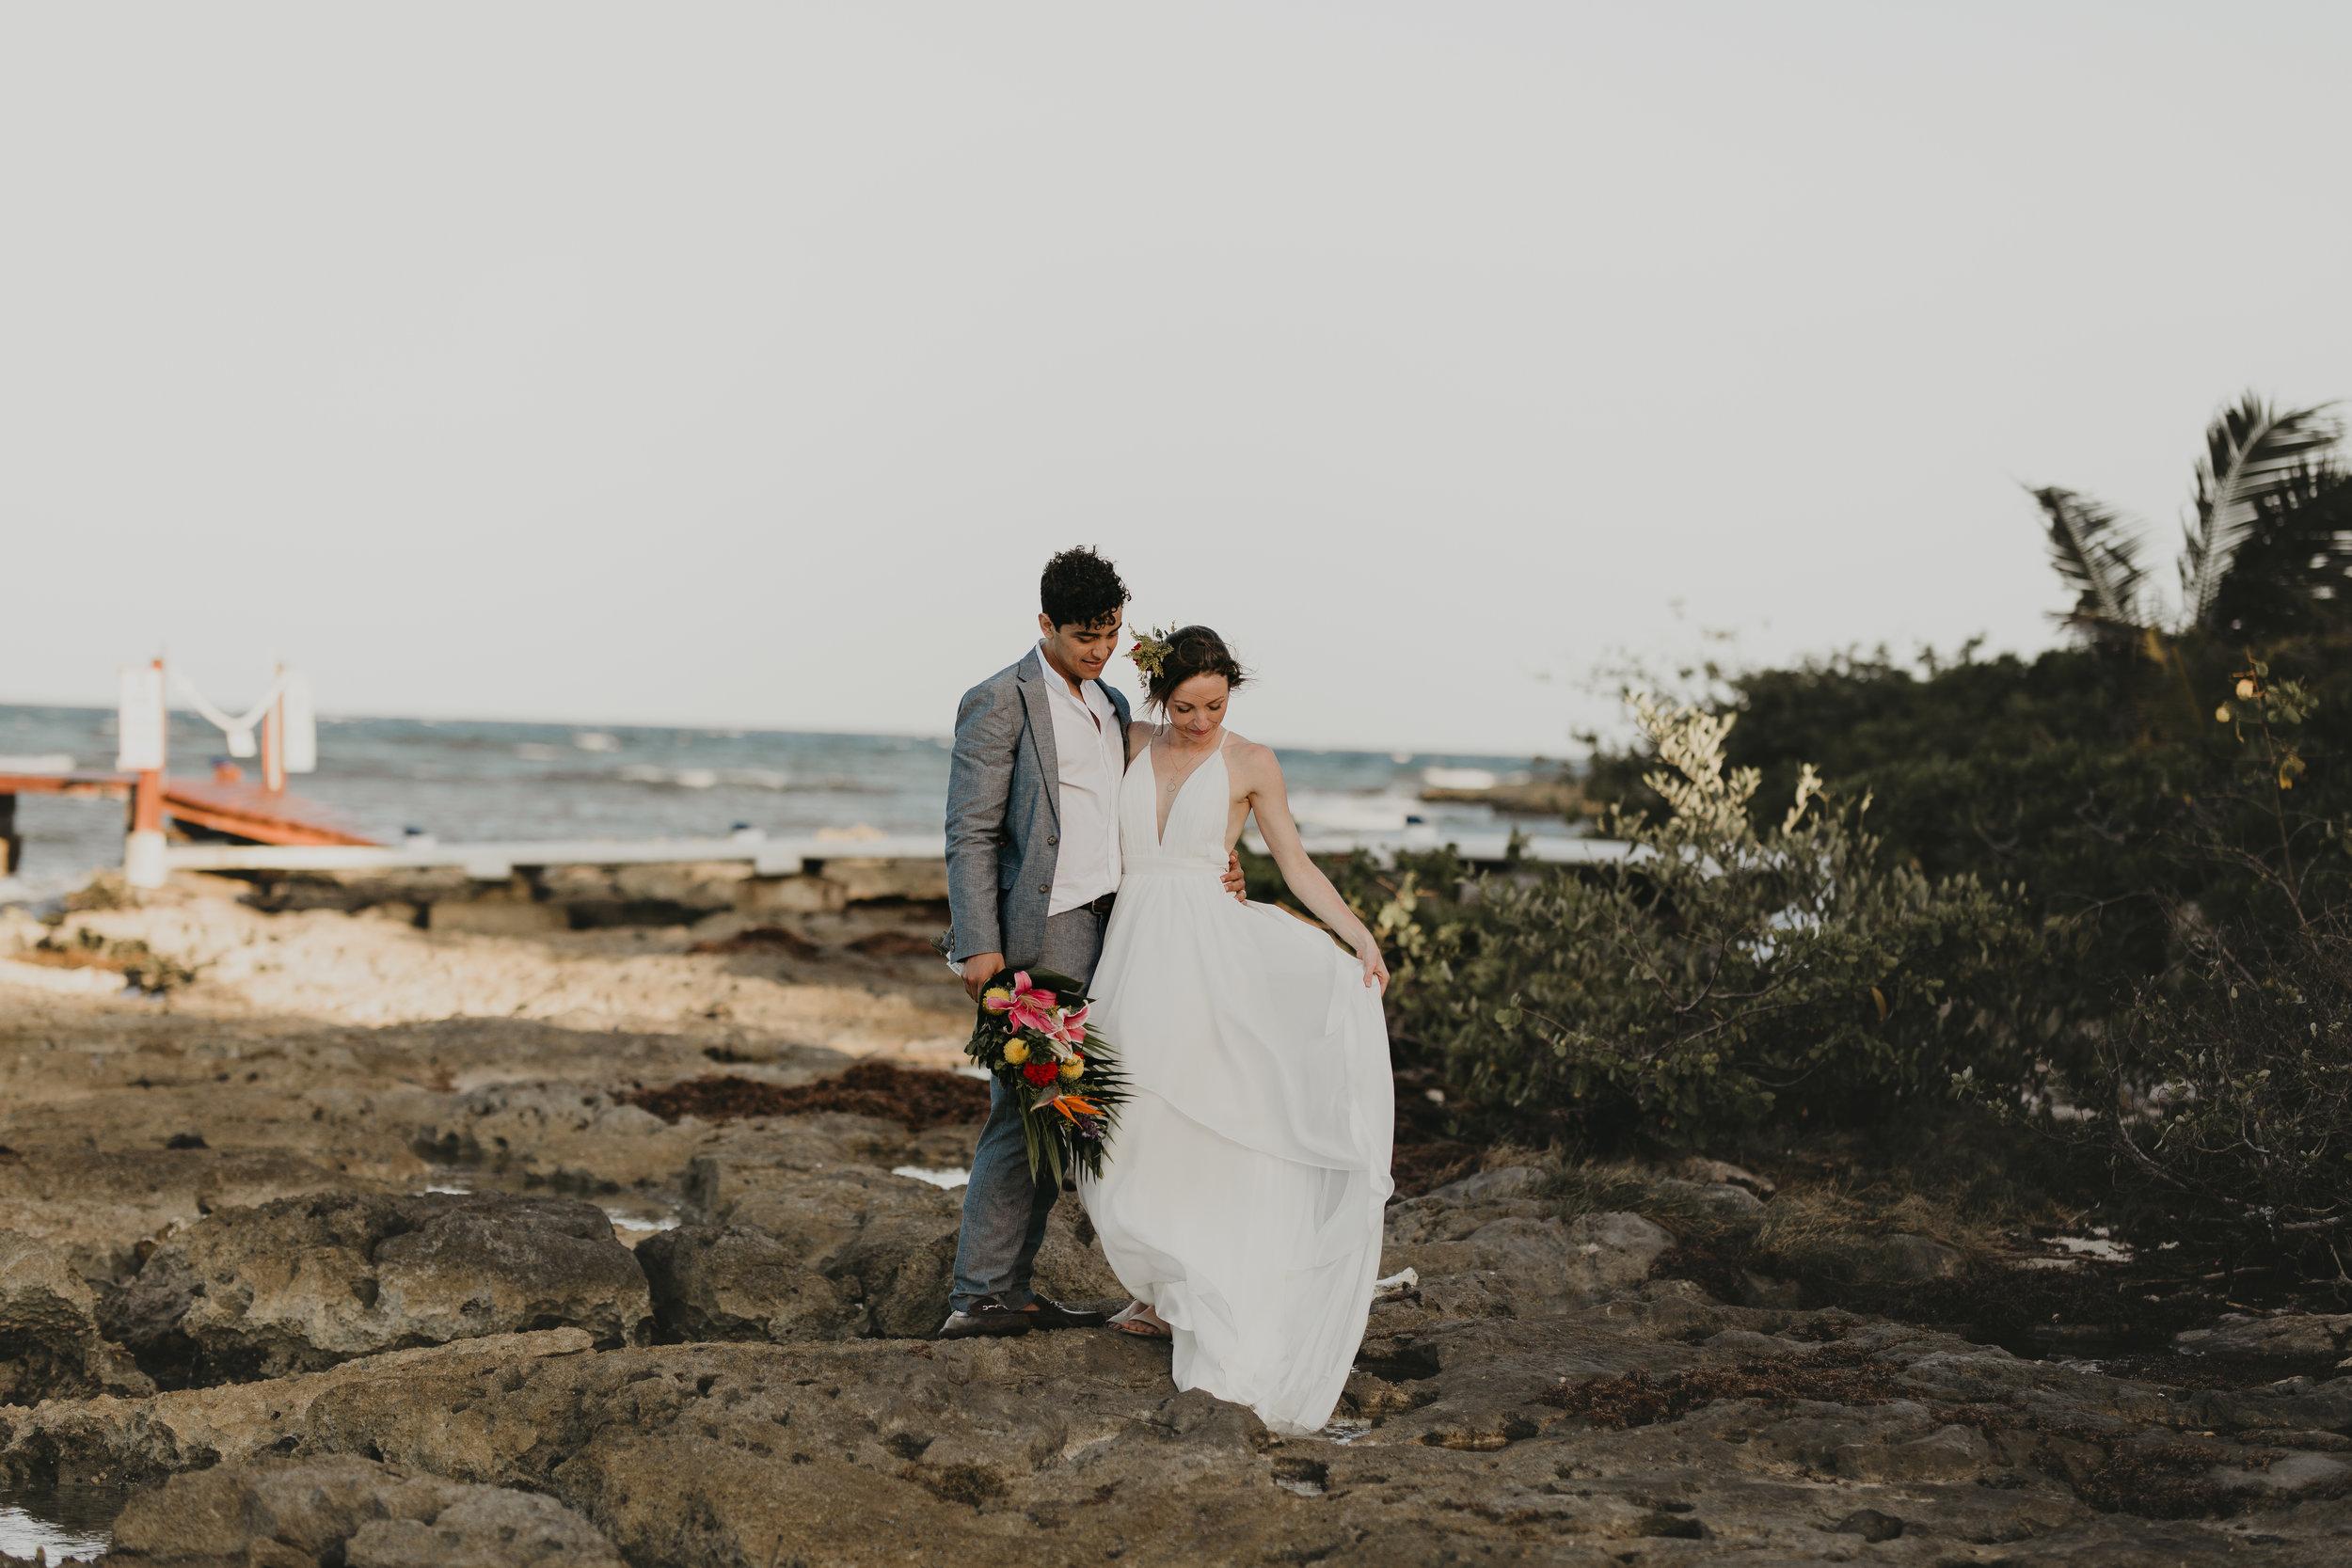 Nicole-Daacke-Photography-beachfront-akumal-destionation-wedding-tulum-mexico-elopement-photographer-destination-wedding-inspiration-sunset-champagne-pop-boho-bride-ocean-tropical-bohemian-tulum-wedding-photos-183.jpg